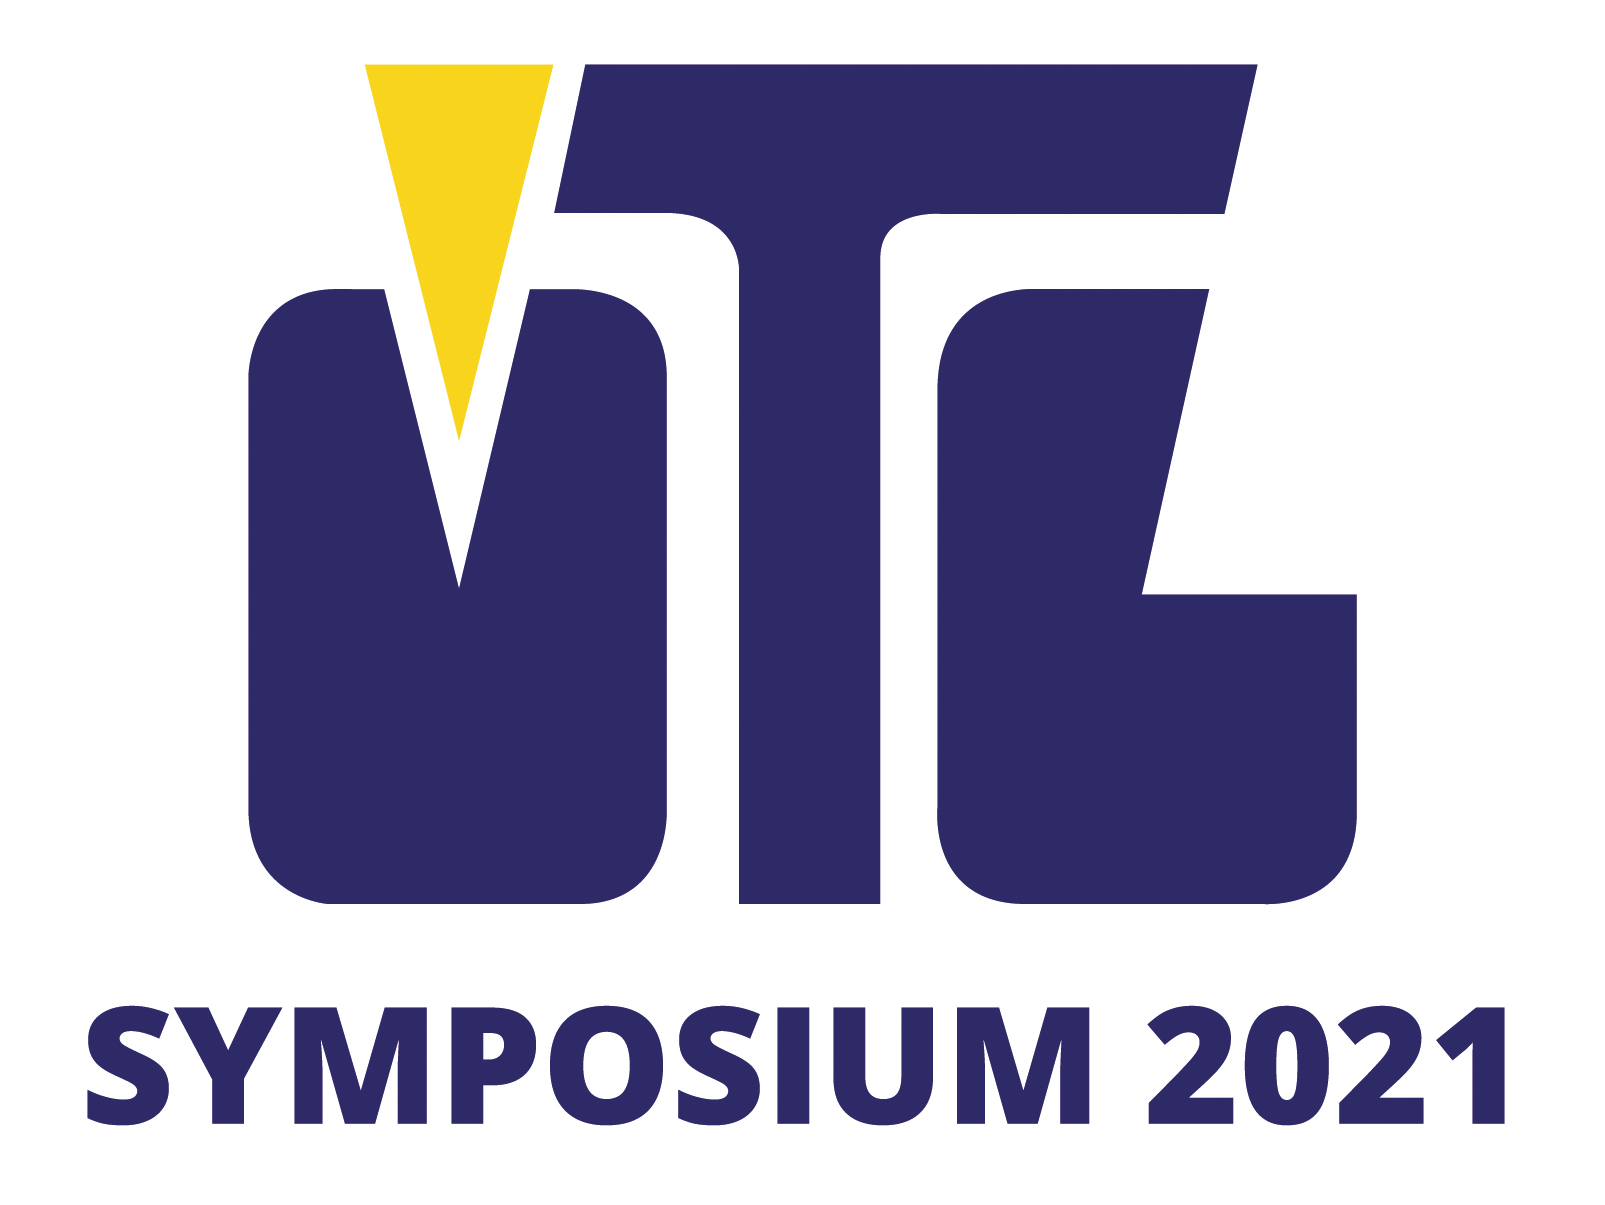 ÖTG-SympoisumLogo